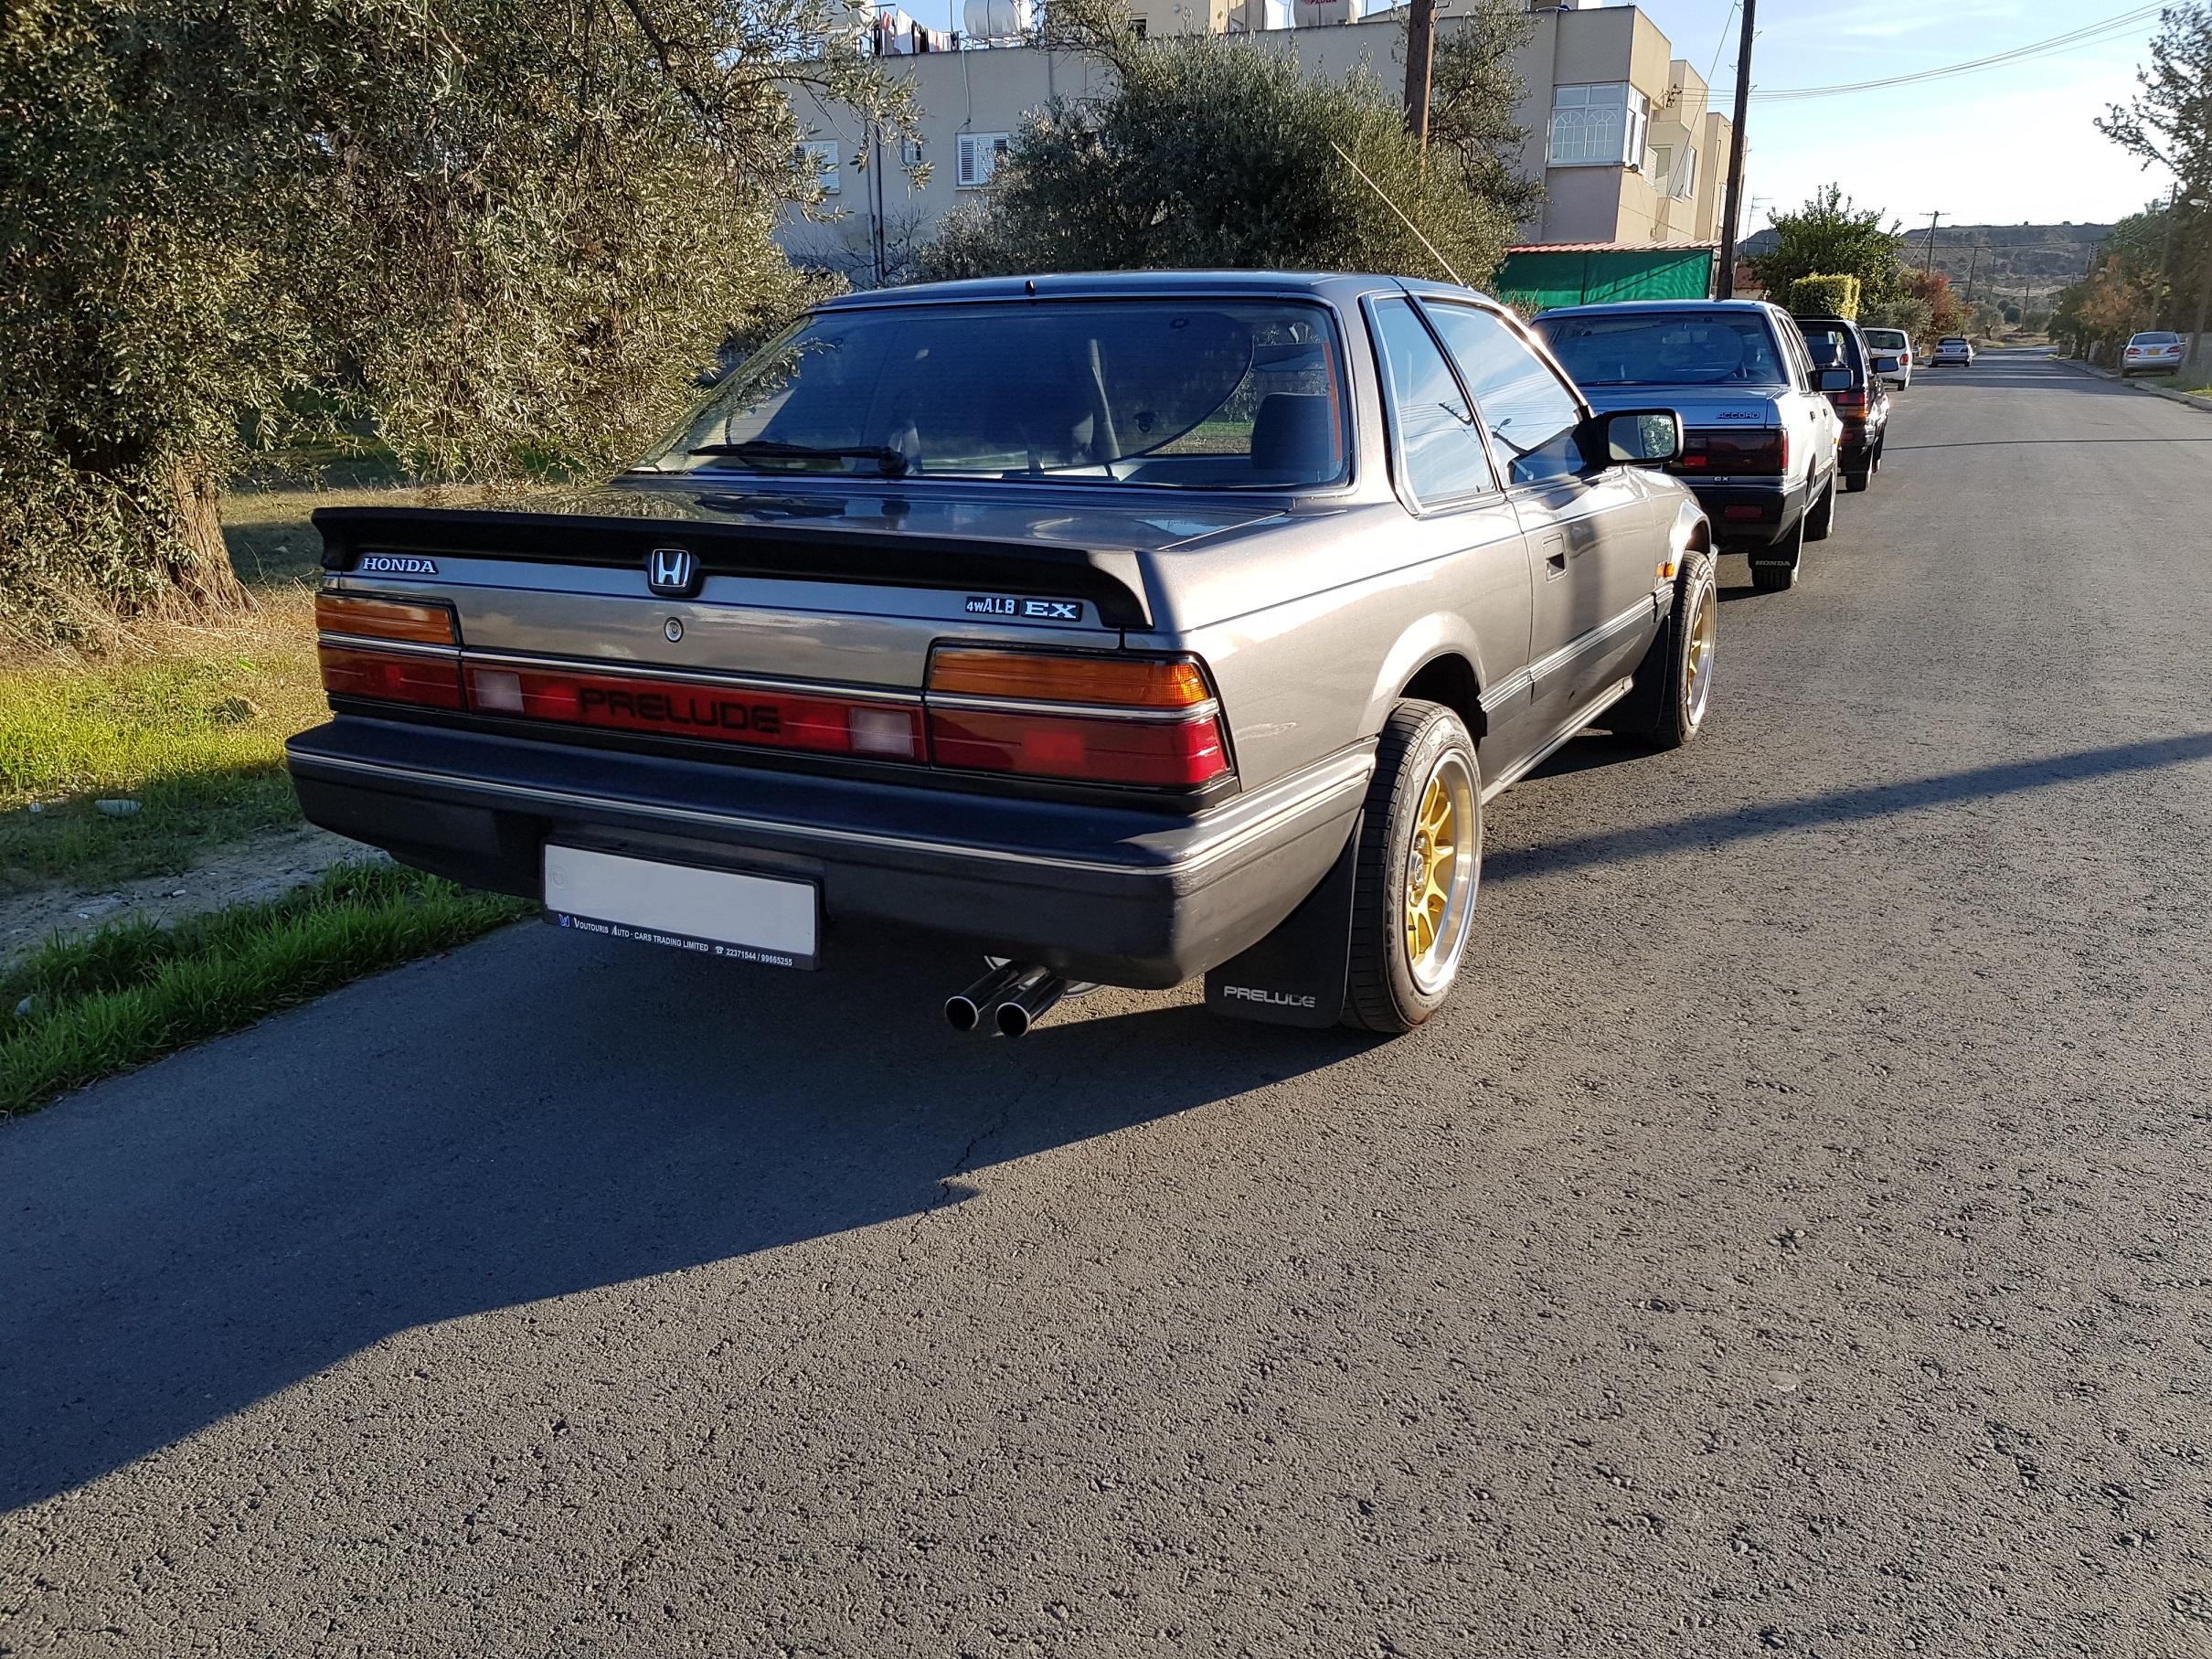 Honda Prelude1